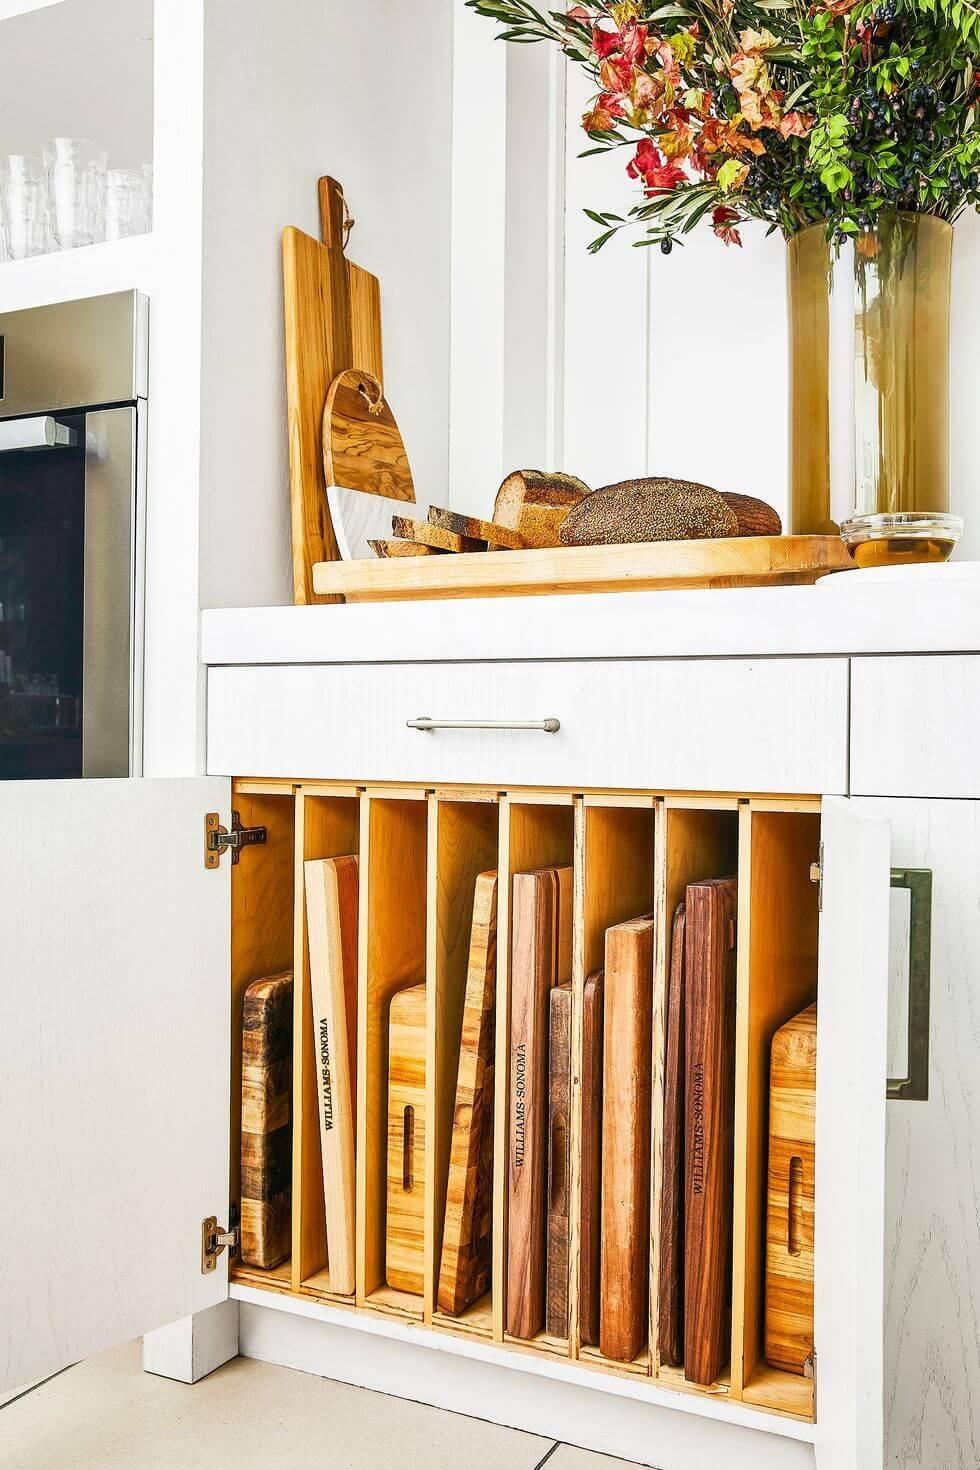 Small Kitchen Storage Ideas 2020 Create Cutting Board Slots